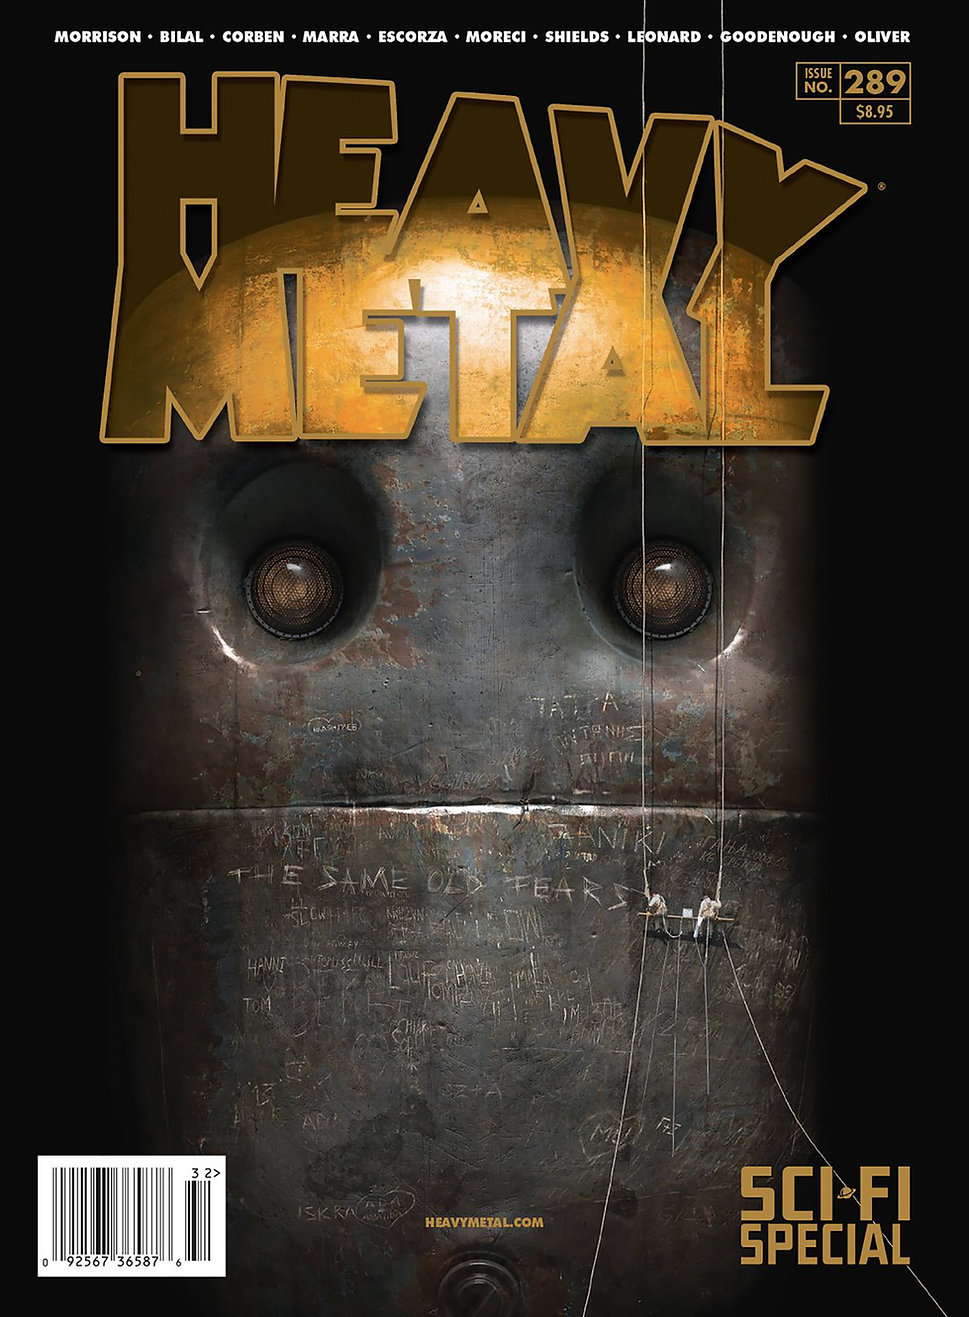 Heavy_Metal_289_Cover_B_1080x.jpg